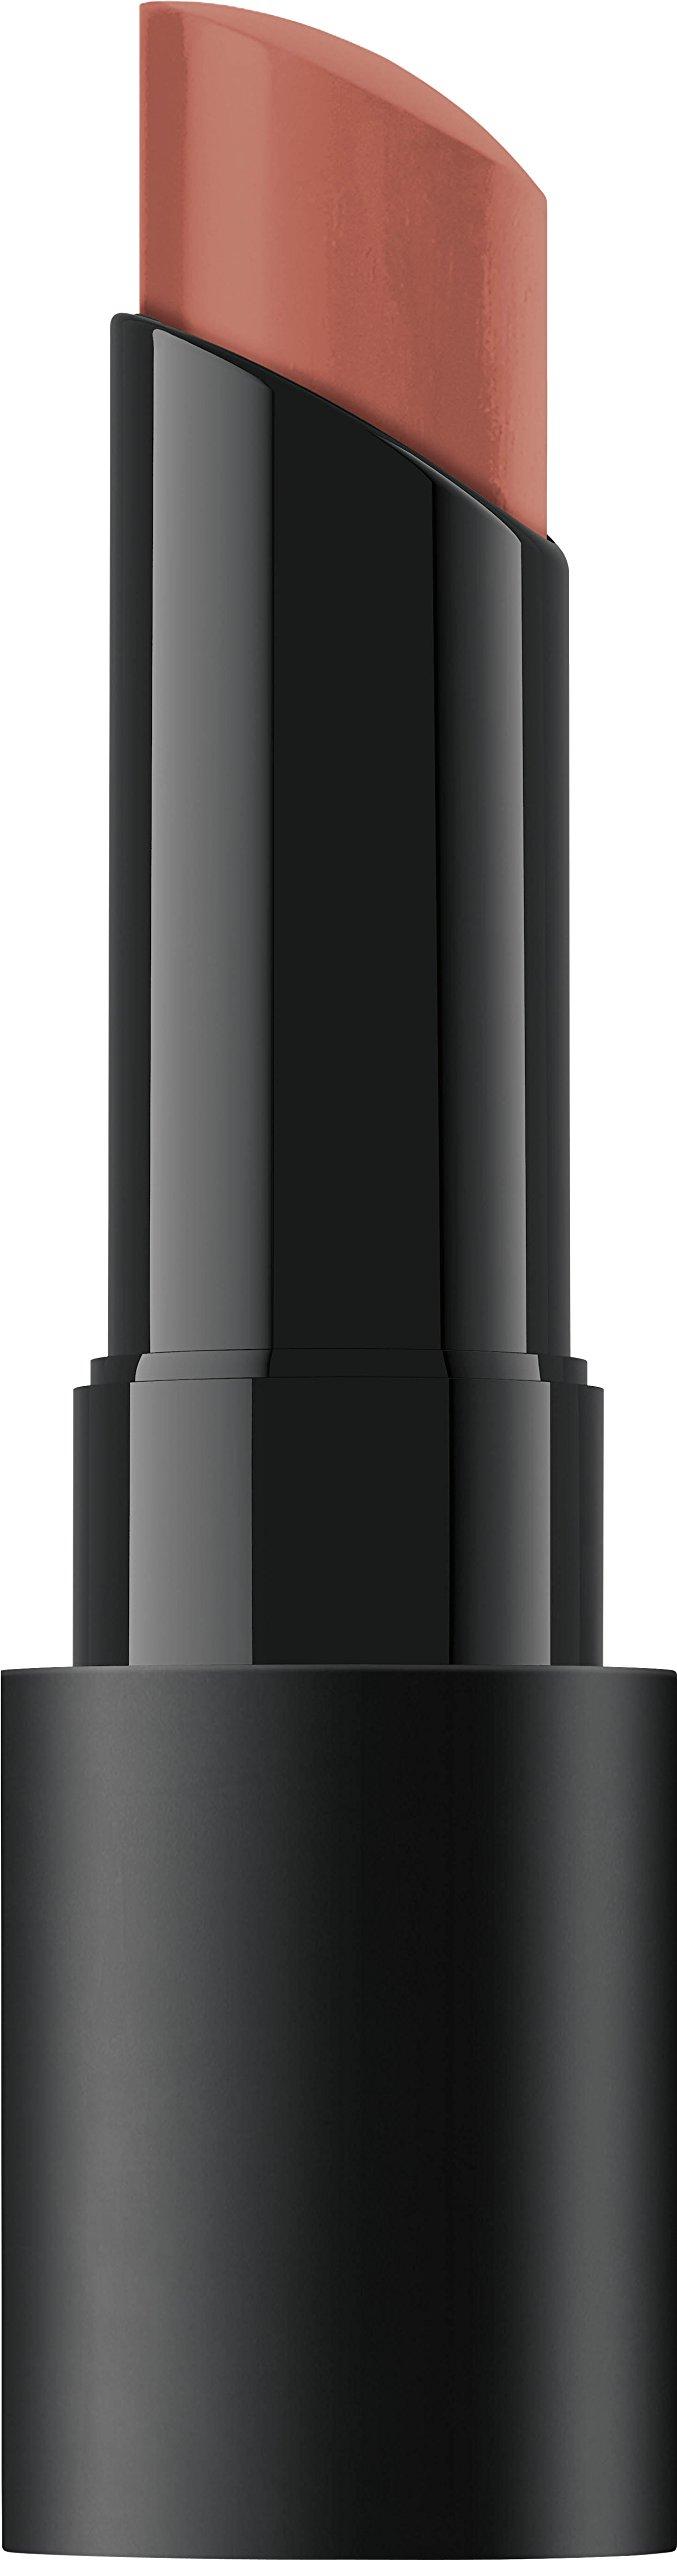 bareMinerals Gen Nude Radiant Lipstick, Mantra, 0.12 Ounce